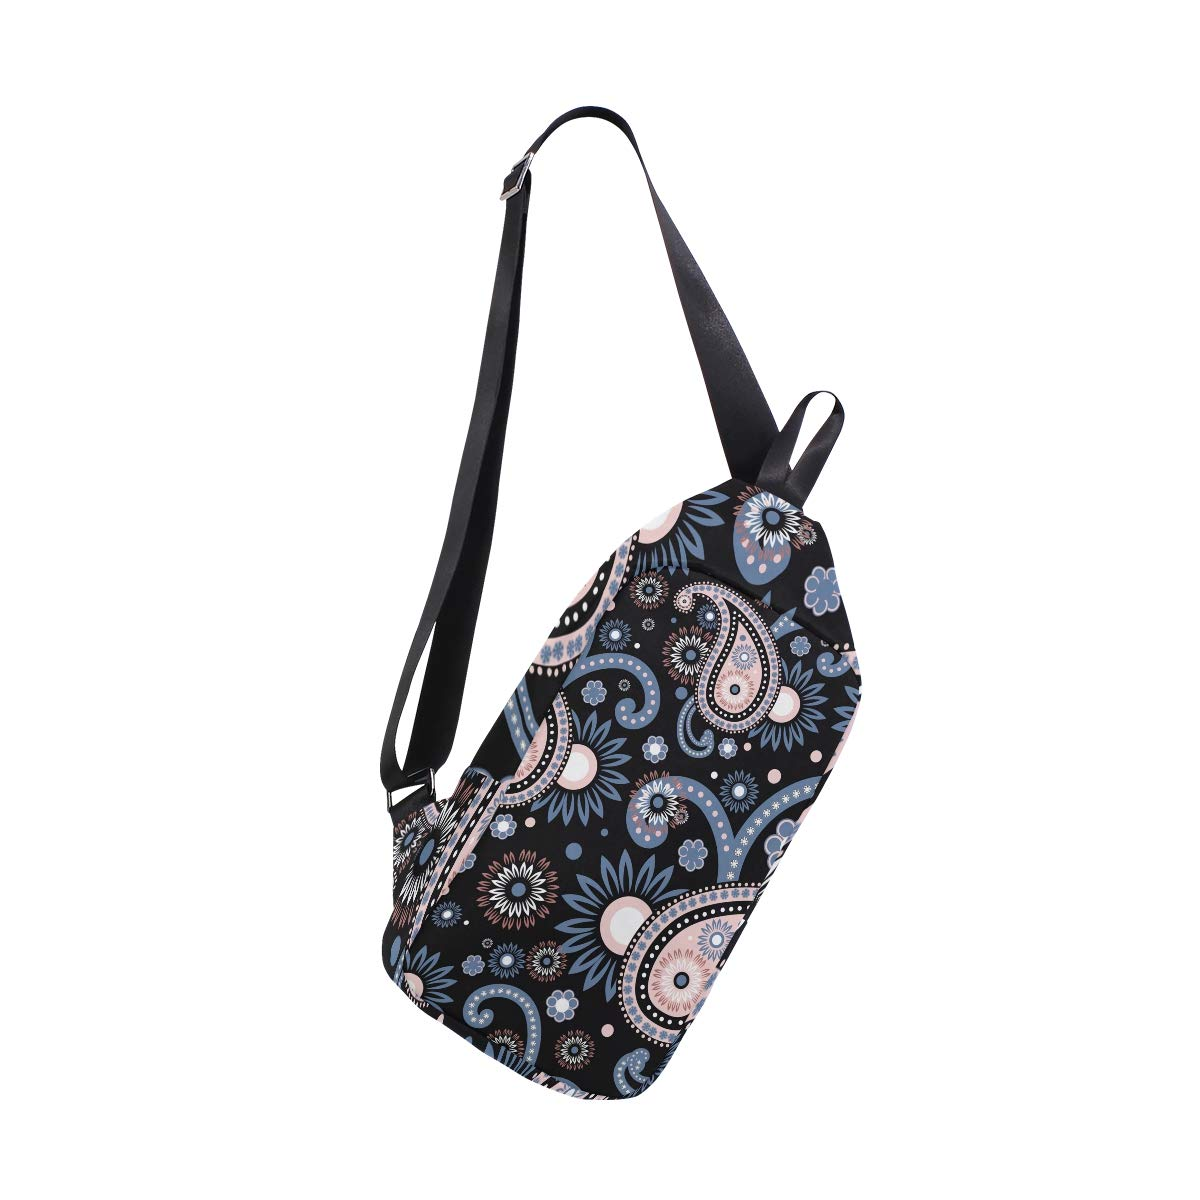 TFONE Ethnic Paisley Flower Crossbody Bag Lightweight Chest Shoulder Messenger Pack Backpack Sling Bag